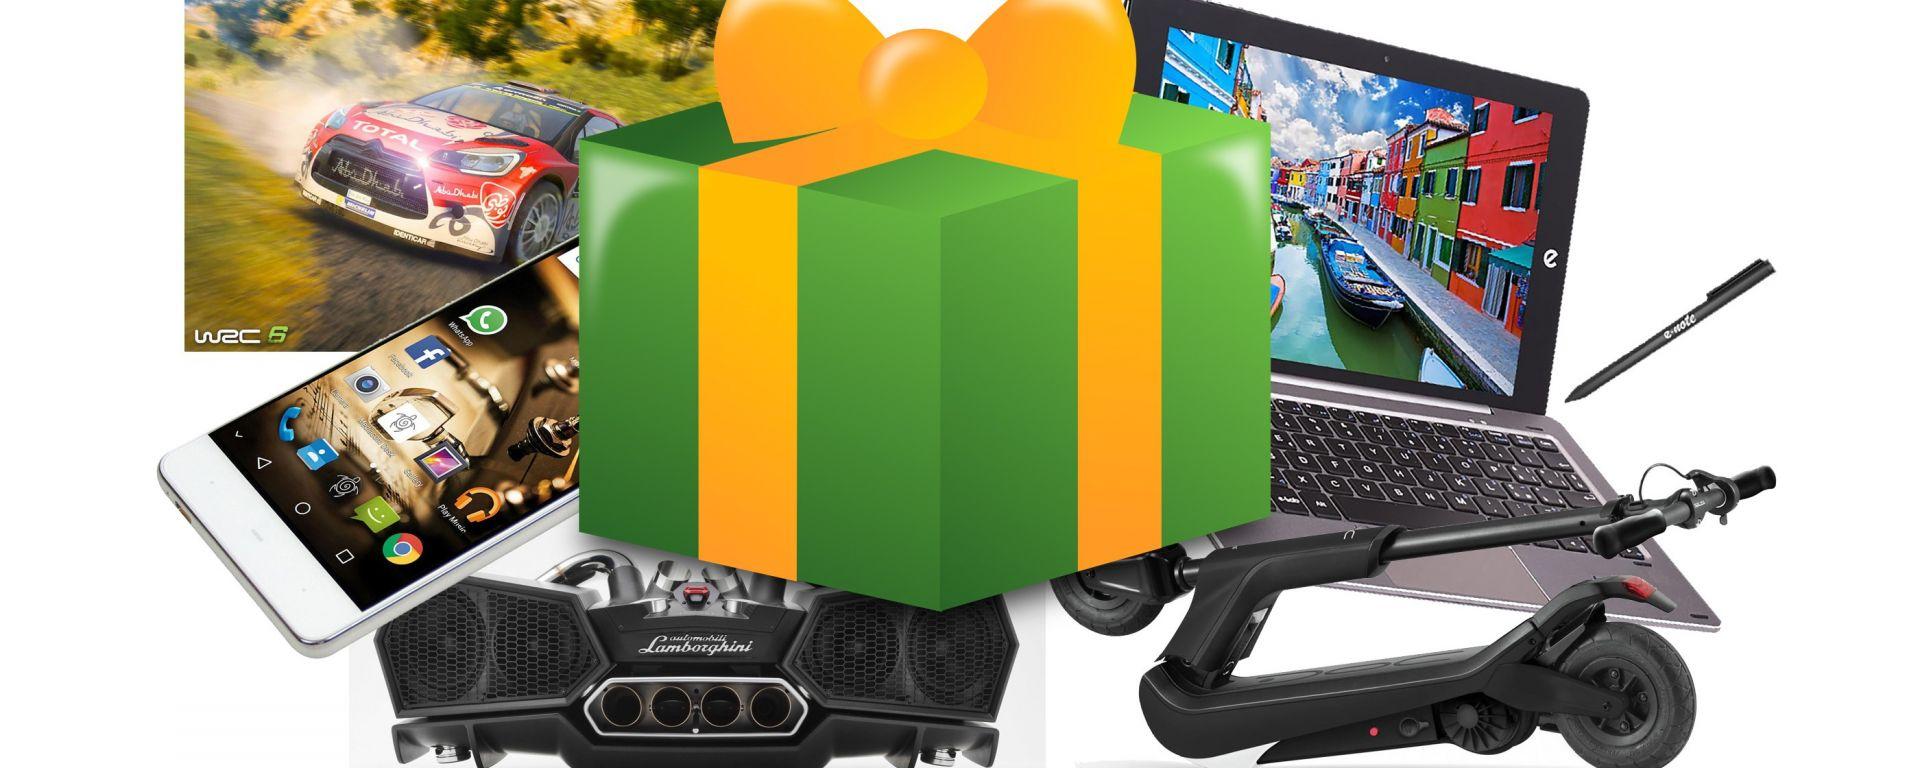 Natale regali last minute regali di natale idee hi tech for Regali hi tech